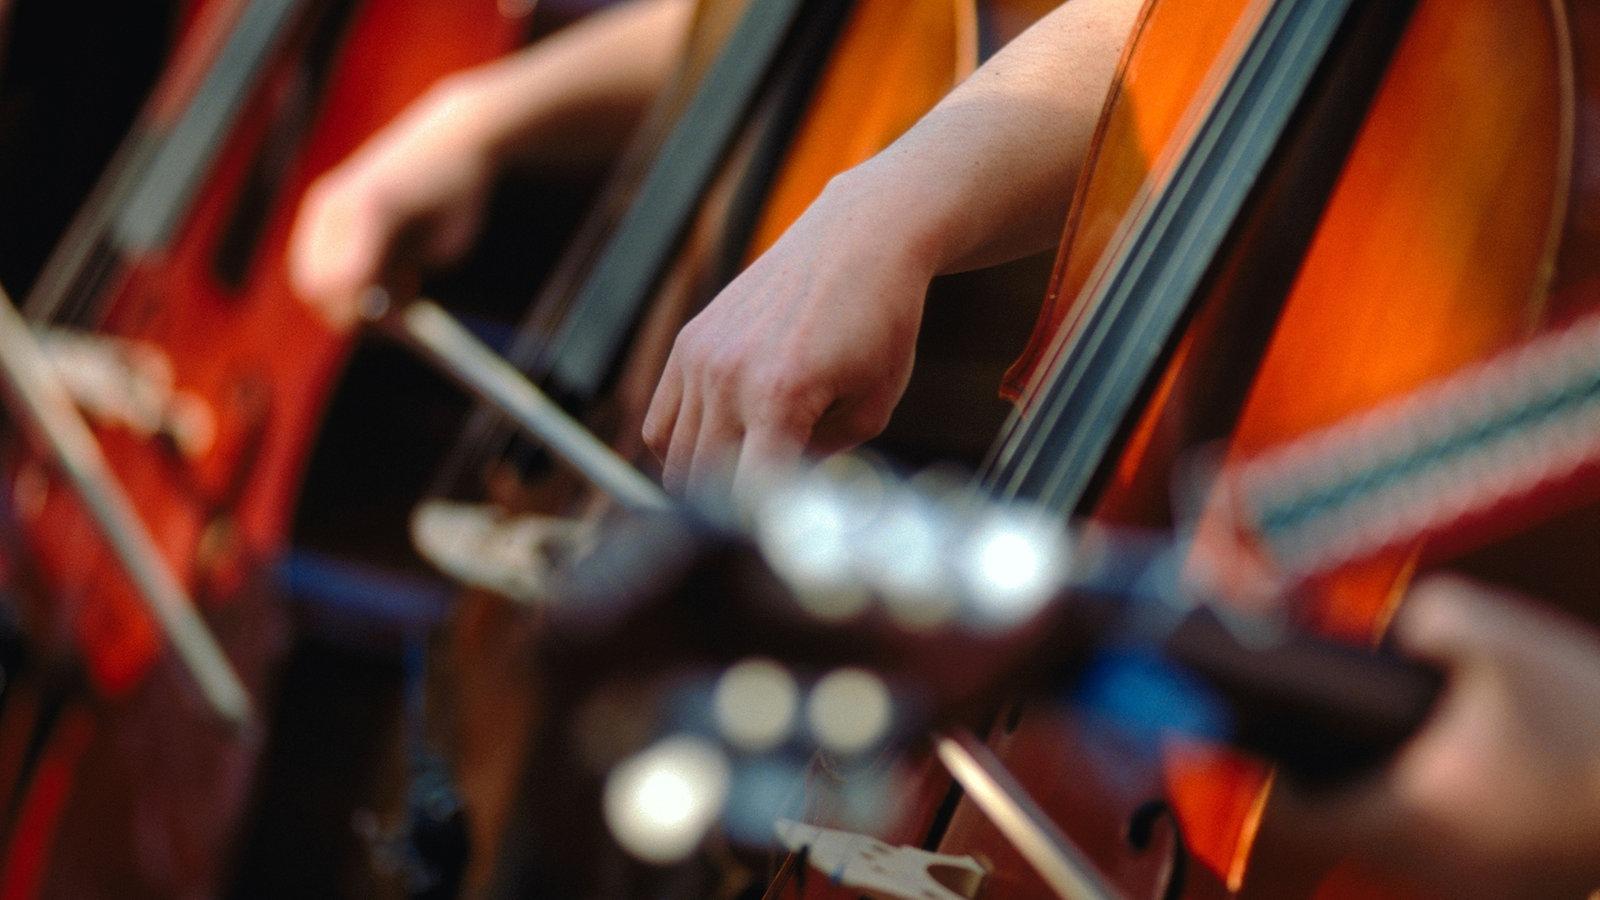 Musik: Macht der Musik - Musik - Kultur - Planet Wissen